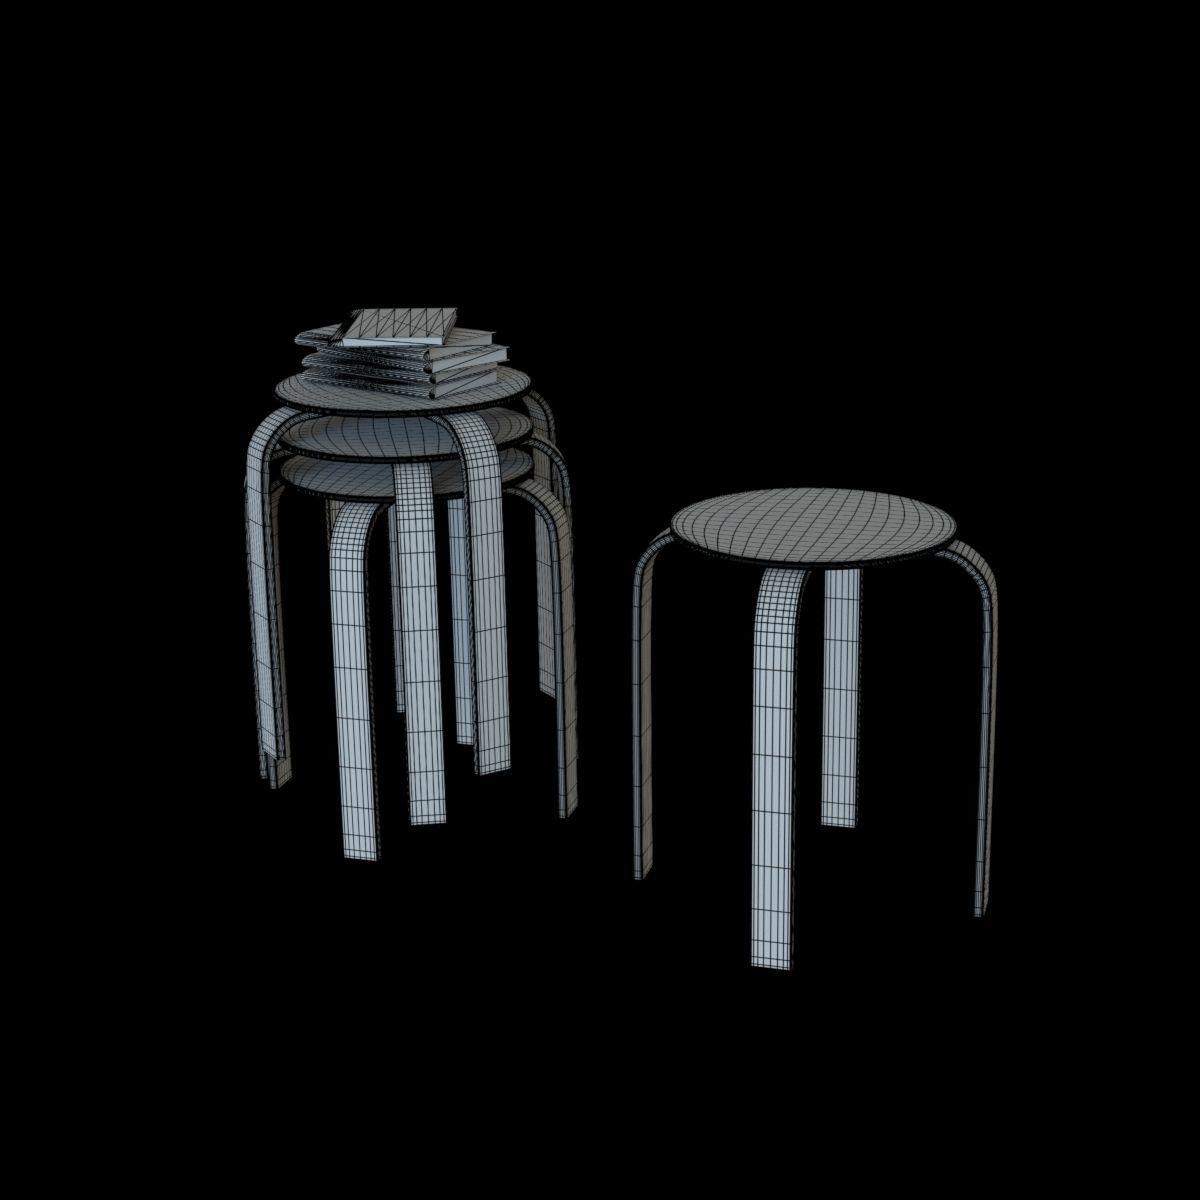 3d Ikea Frosta Stool Cgtrader Black Model Obj Mtl Fbx Lwo Lw Lws Dae Lxo Lxl Abc 2